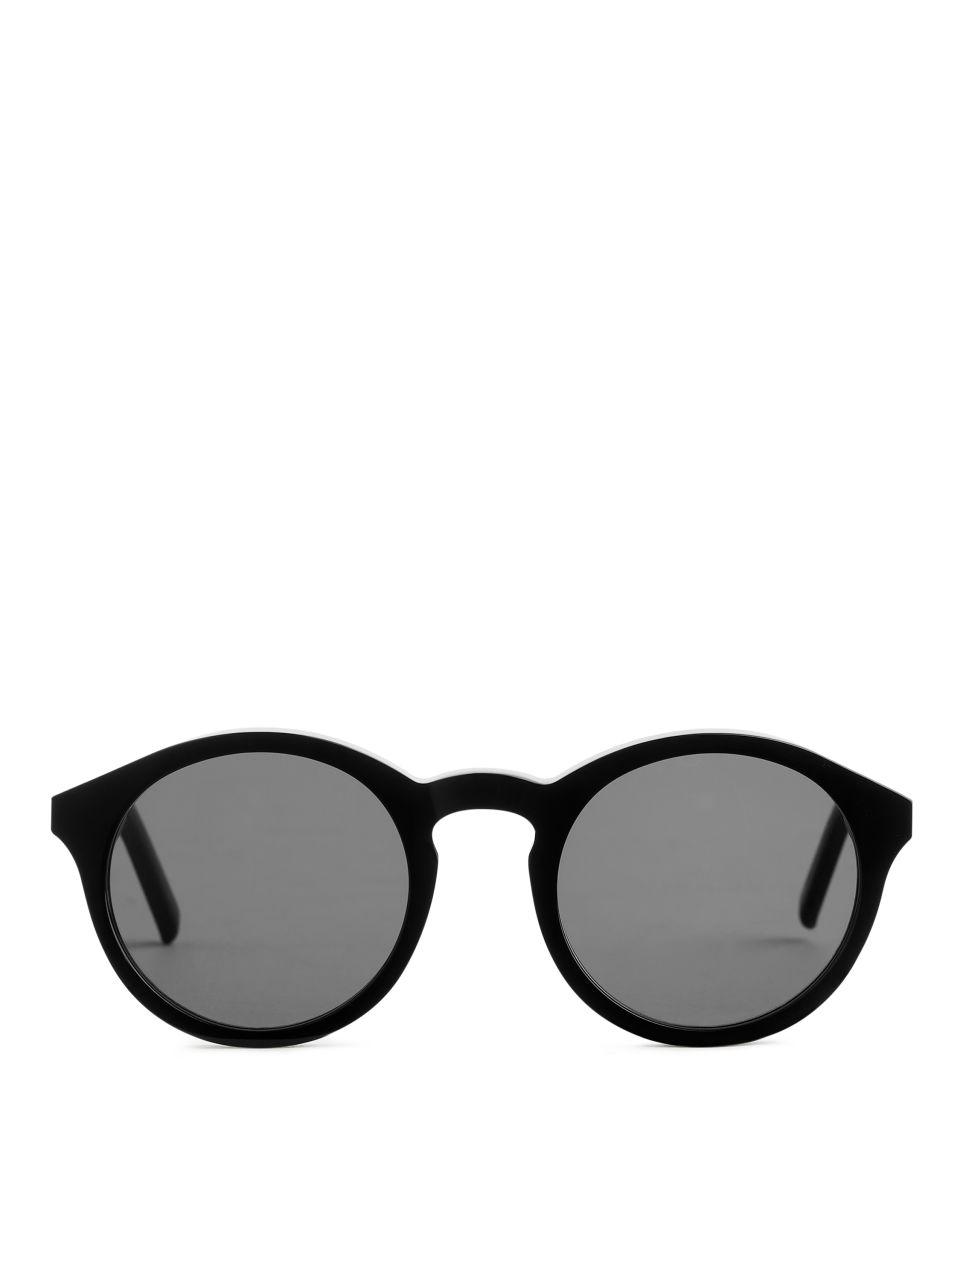 Monokel Eyewear Barstow Sunglasses - Black